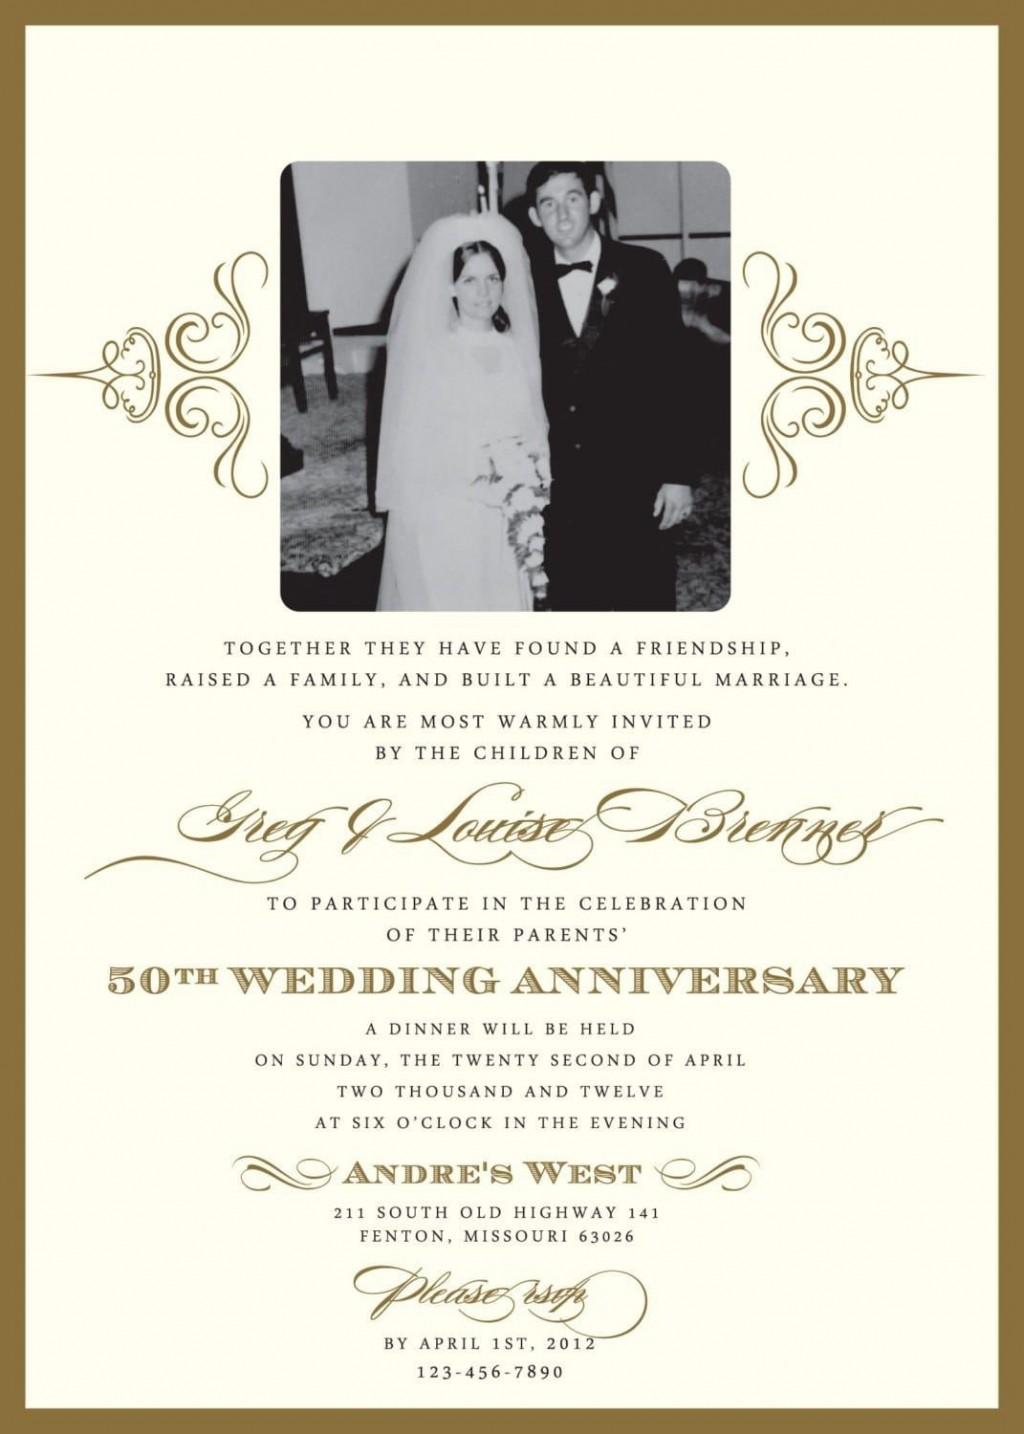 000 Wondrou 50th Anniversary Invitation Template High Resolution  Wedding Microsoft Word Free DownloadLarge